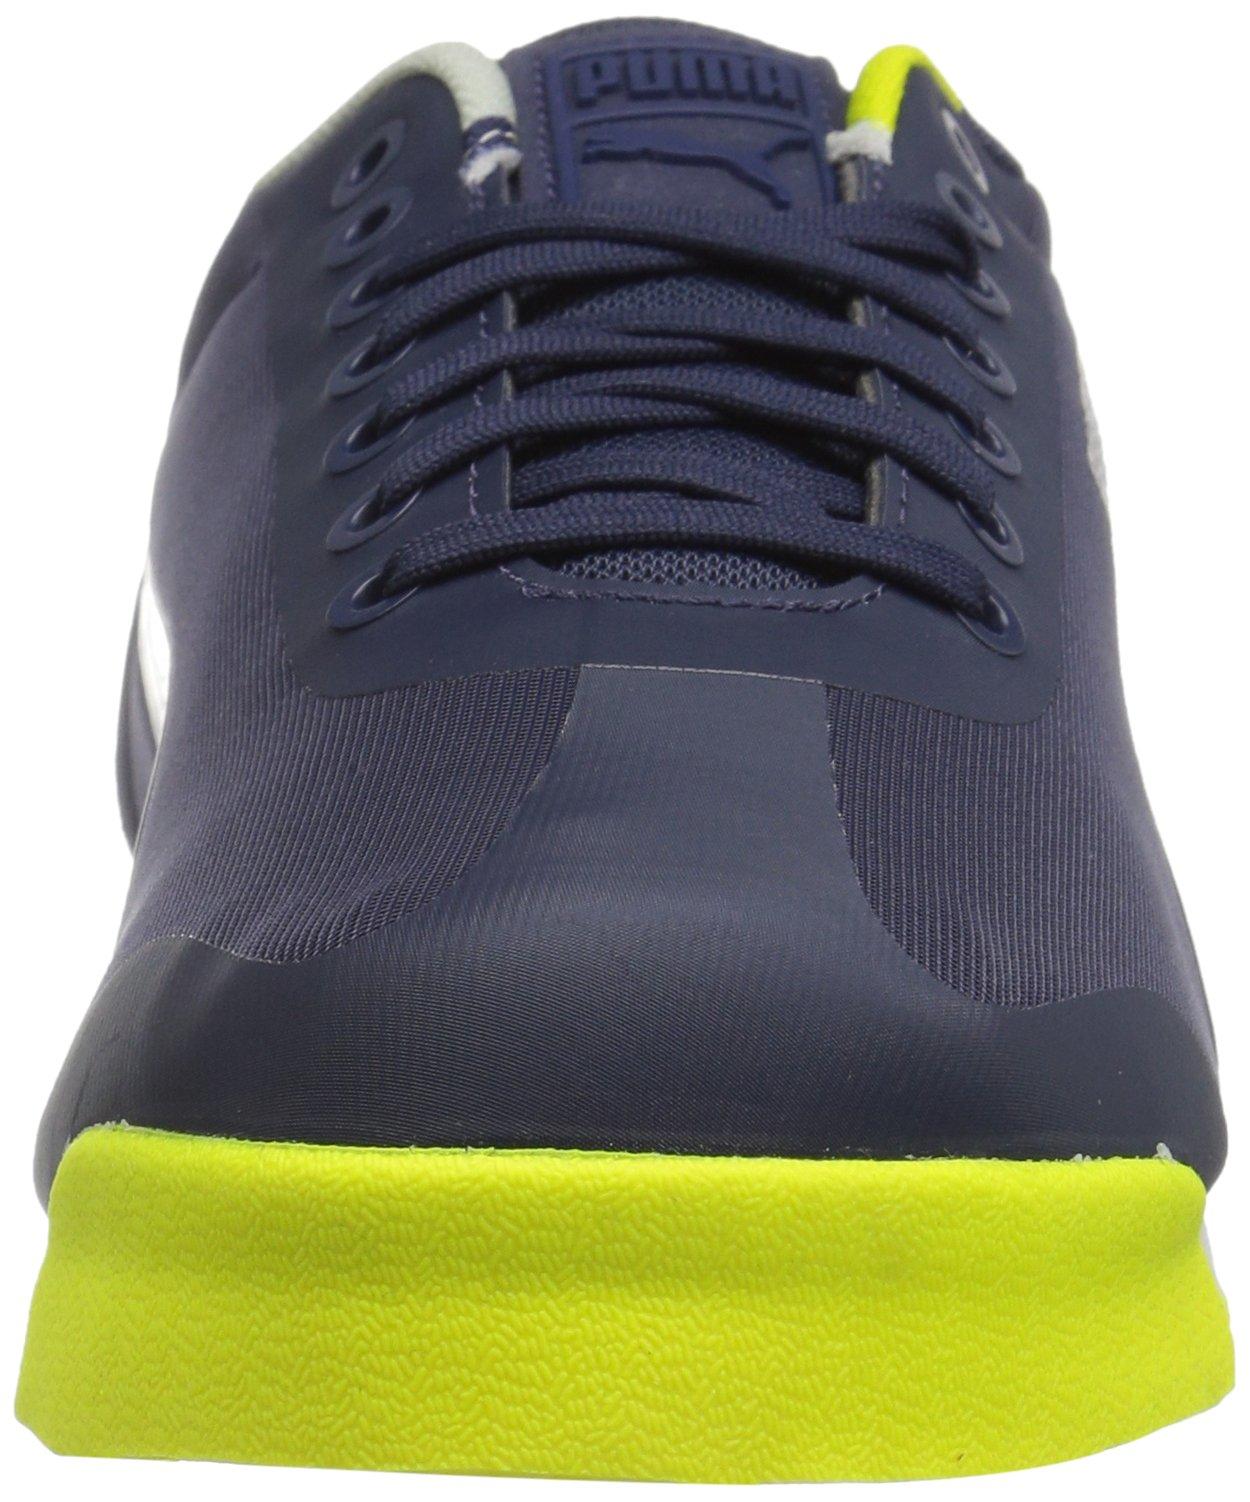 PUMA Men's Roma Basic Geometric Camo Fashion Sneaker